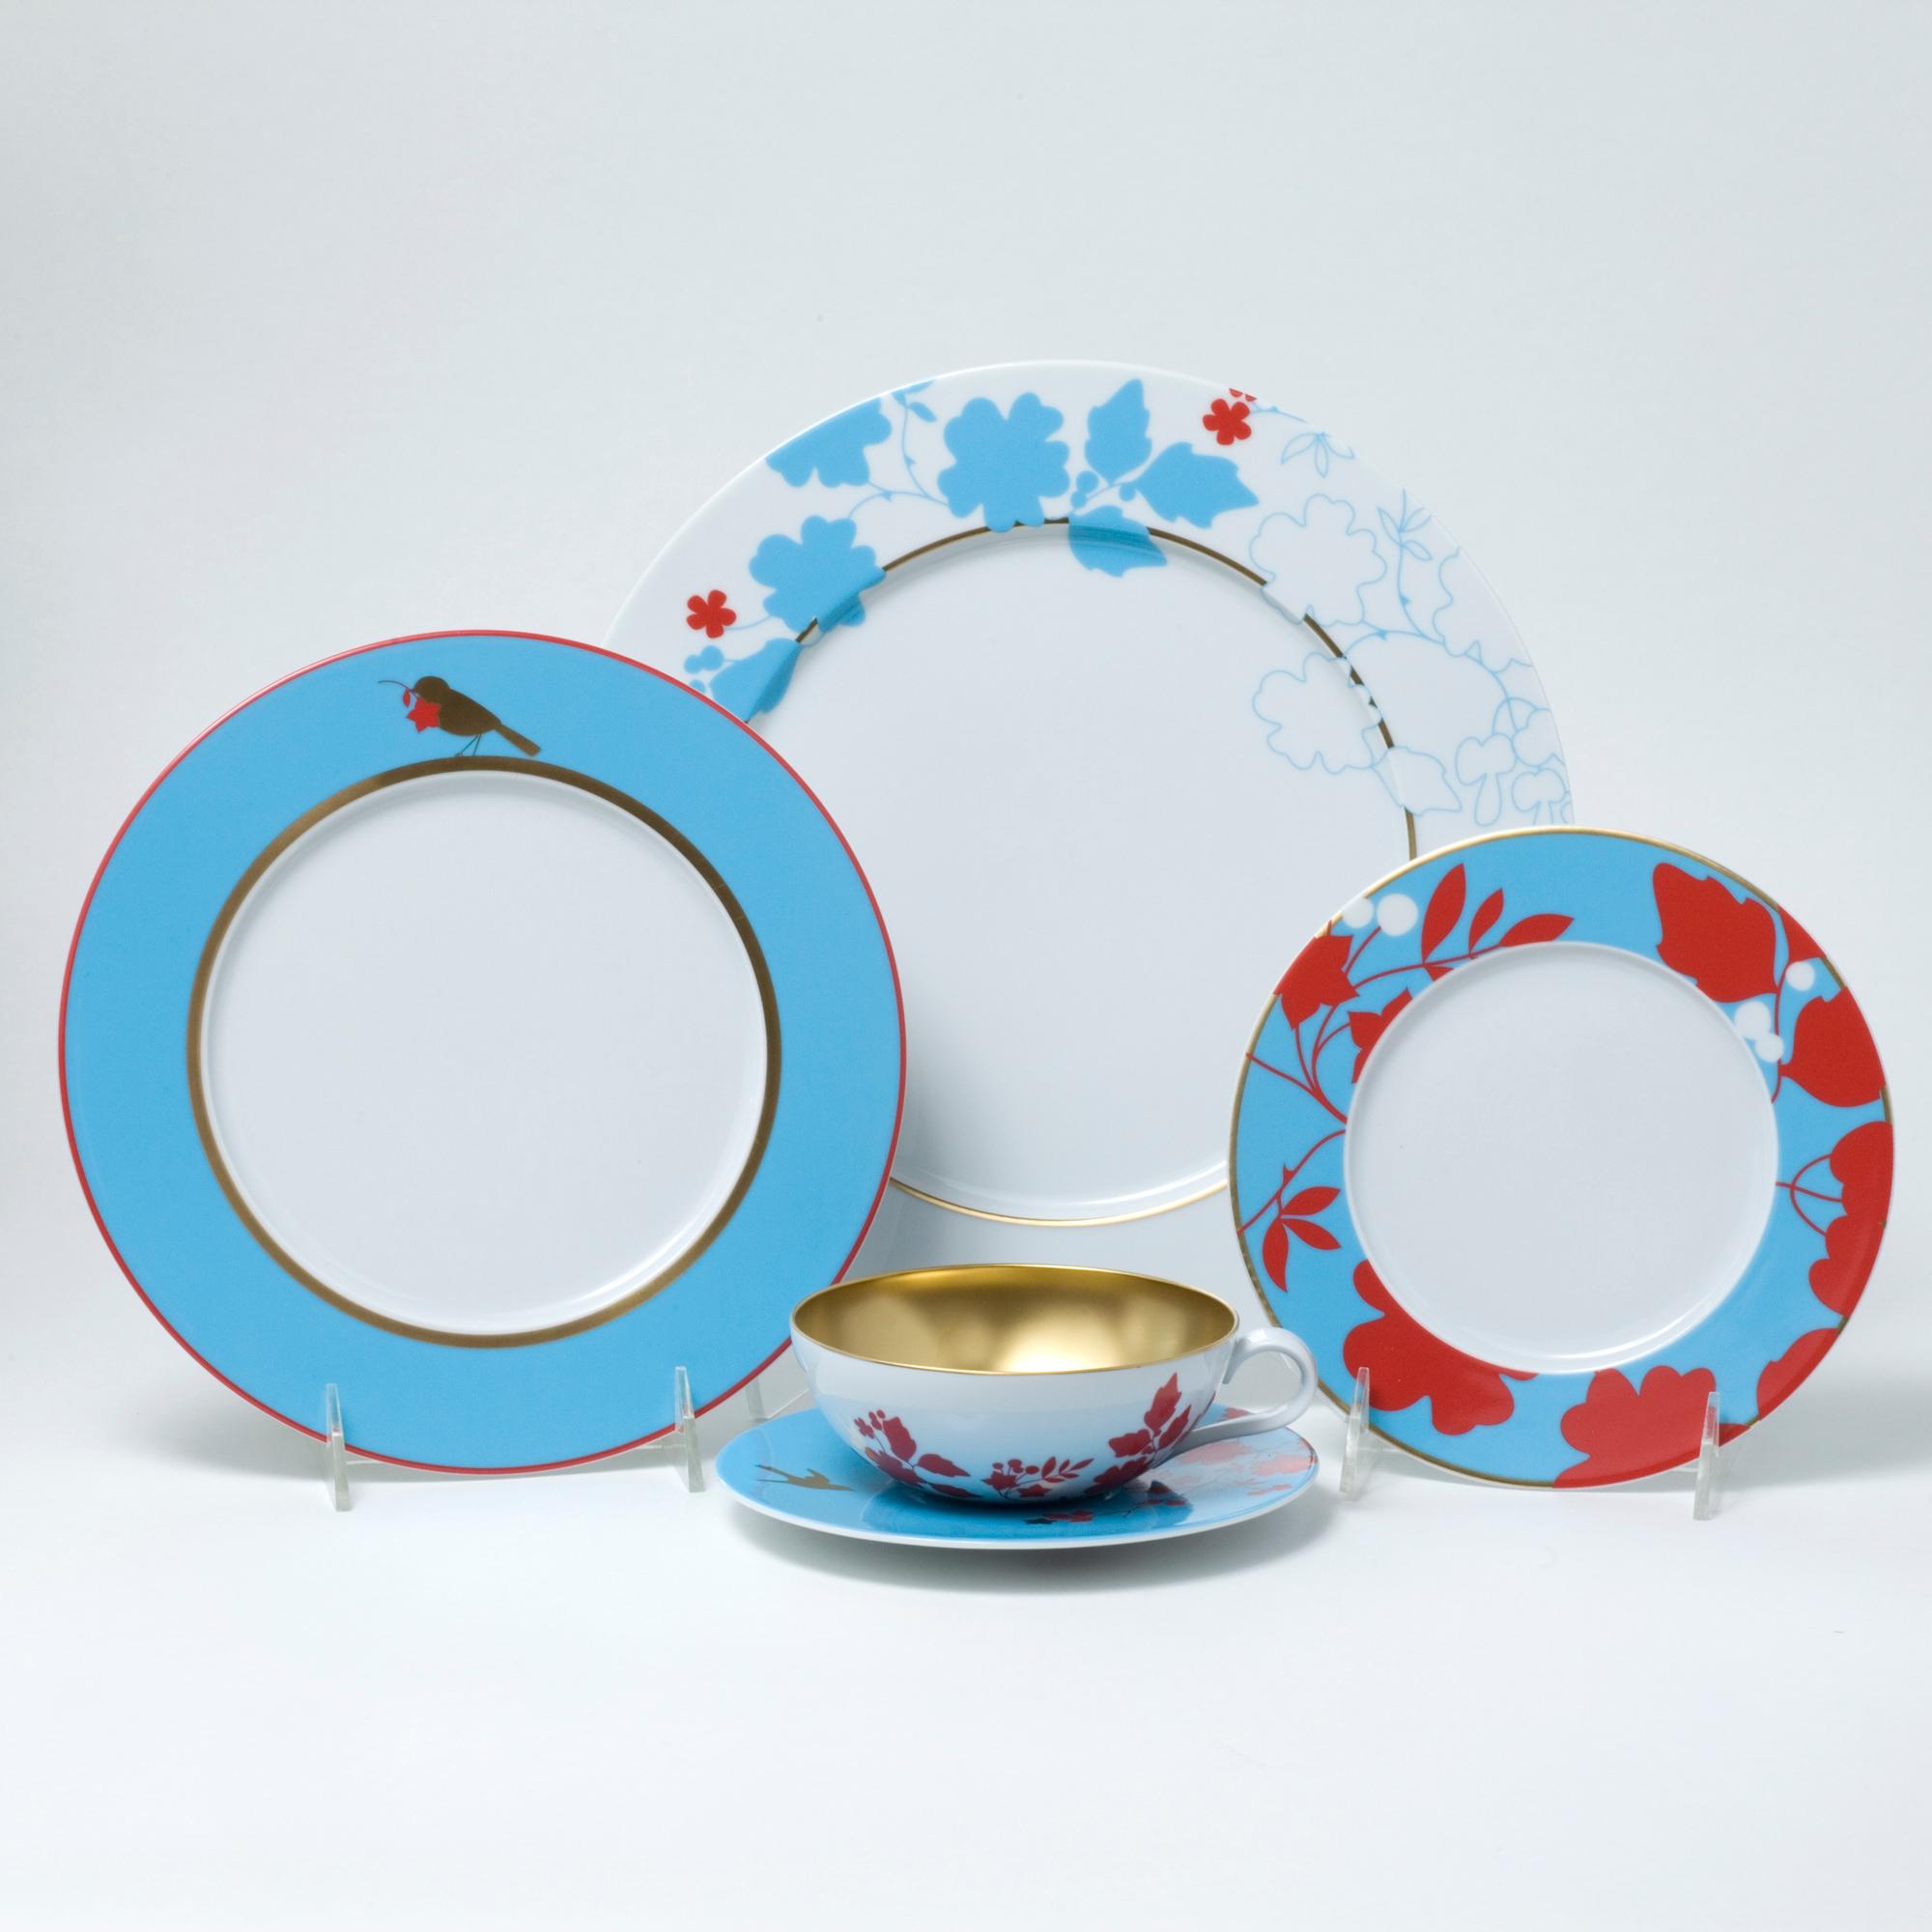 sc 1 st  Gumpu0027s & Sieger For Furstenberg Emperoru0027s Garden Dinnerware | Gumpu0027s